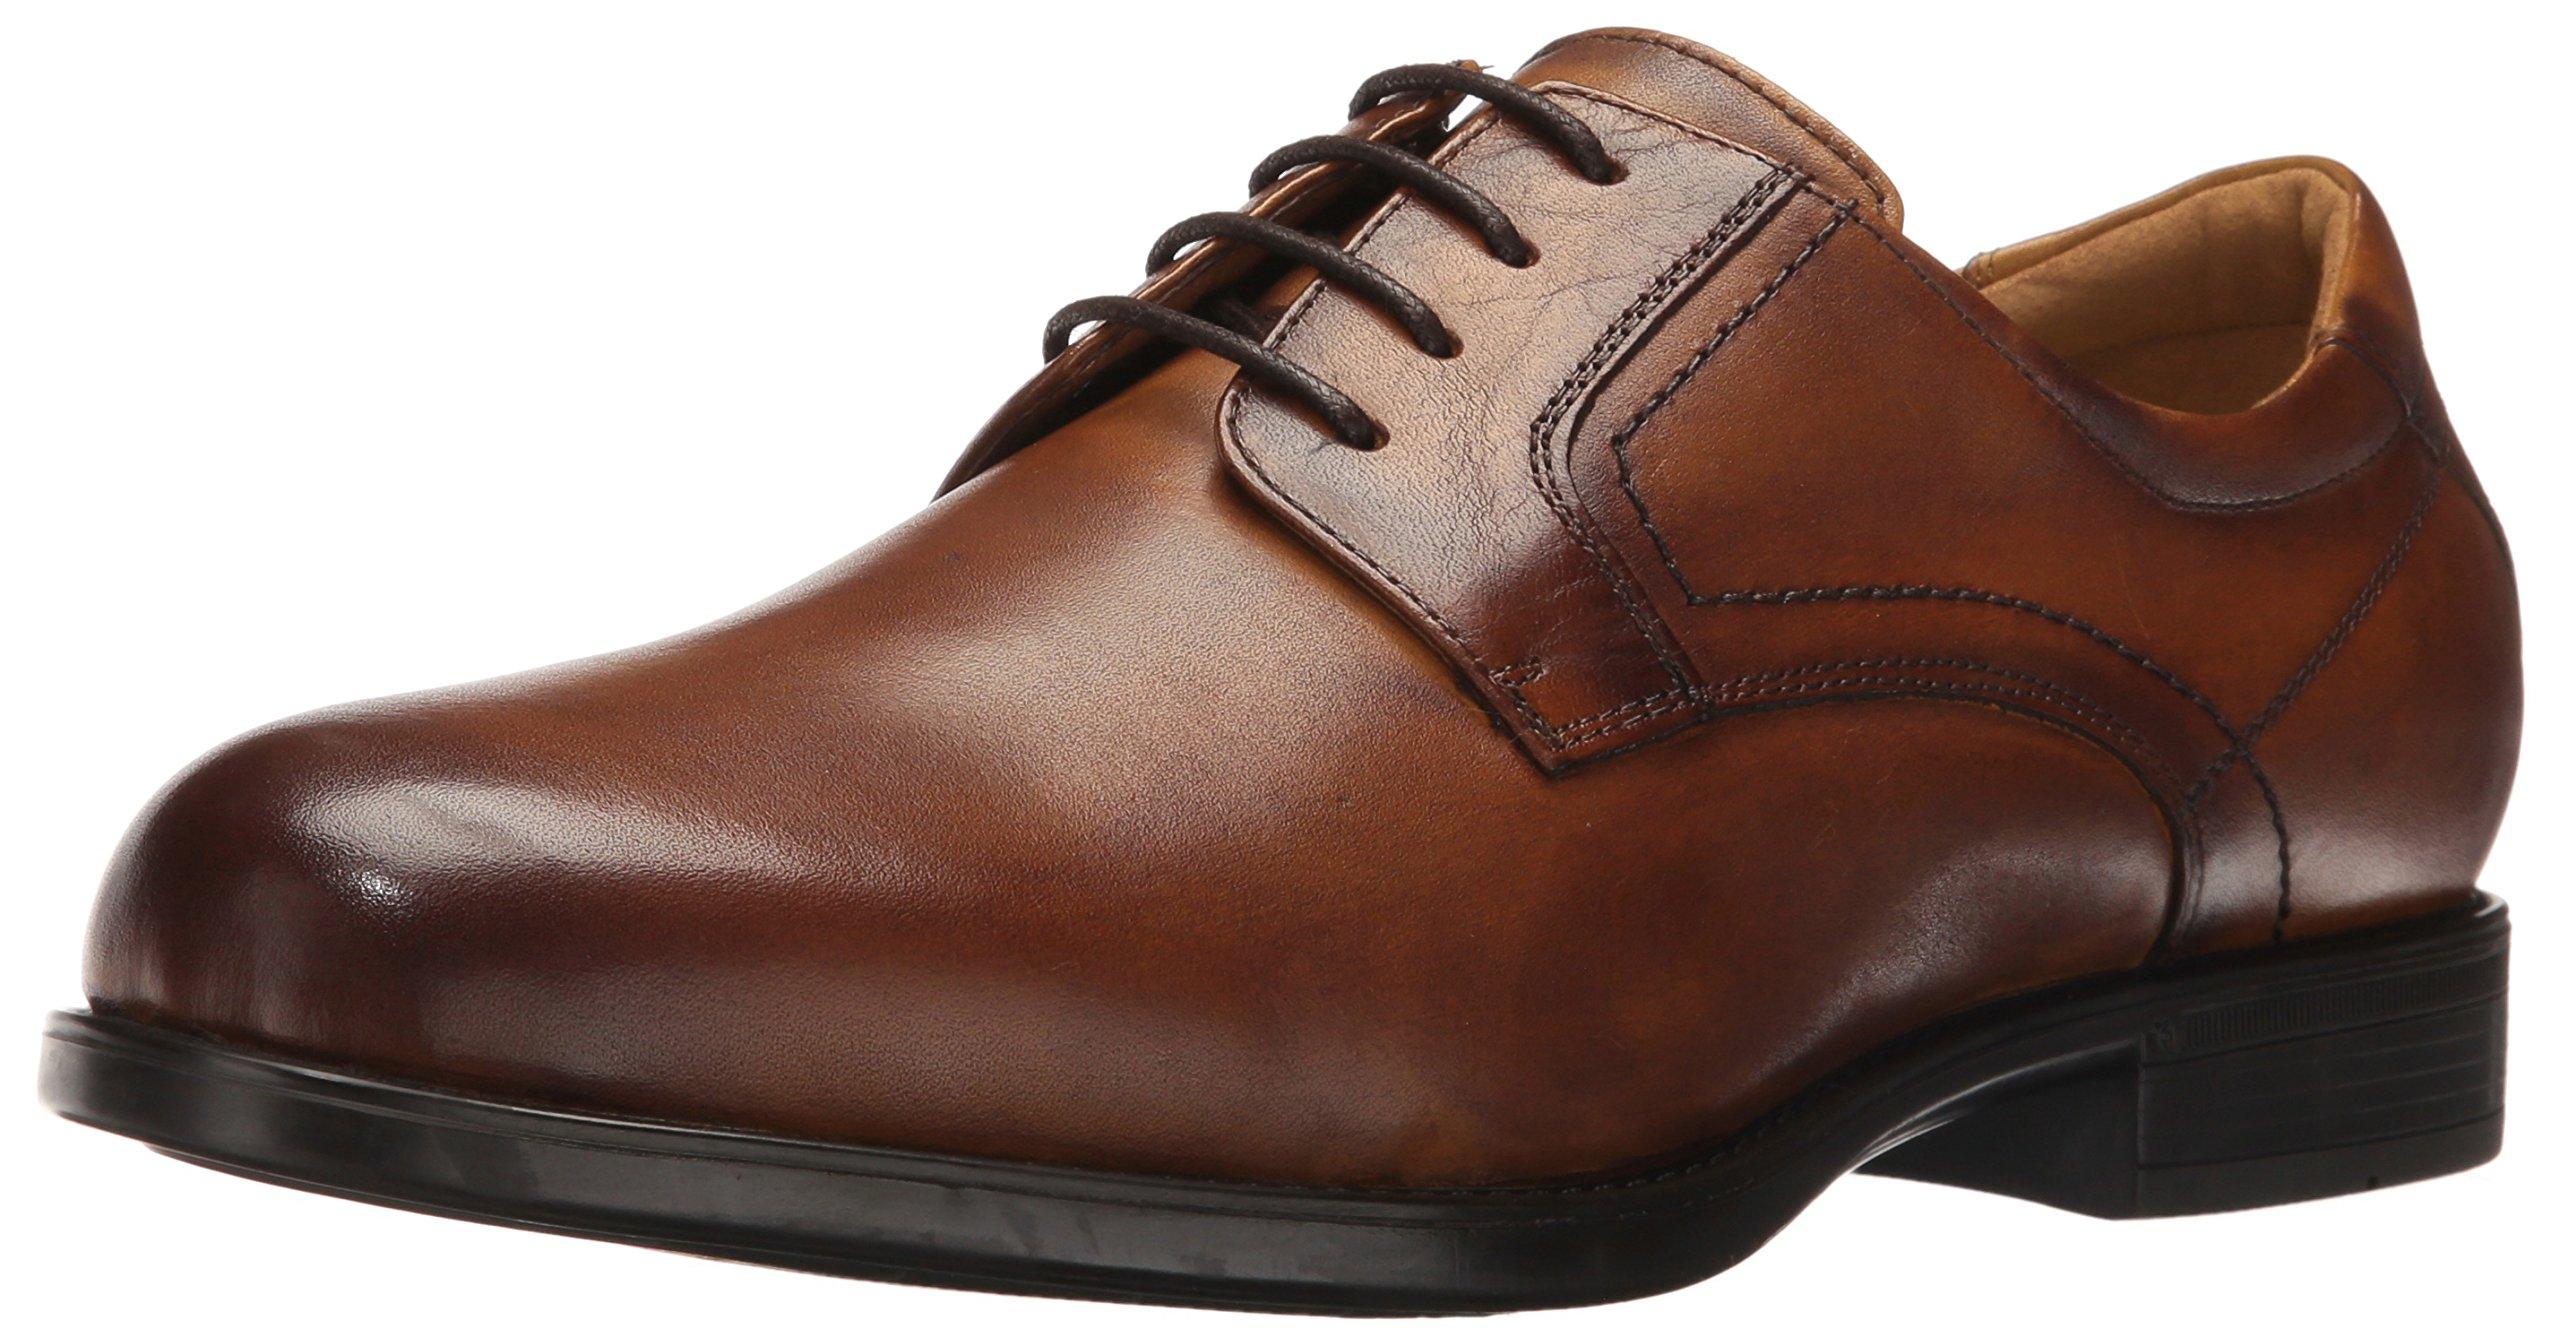 Florsheim Men's Medfield Plain Toe Oxford Dress Shoe, Cognac, 10.5 Wide by Florsheim